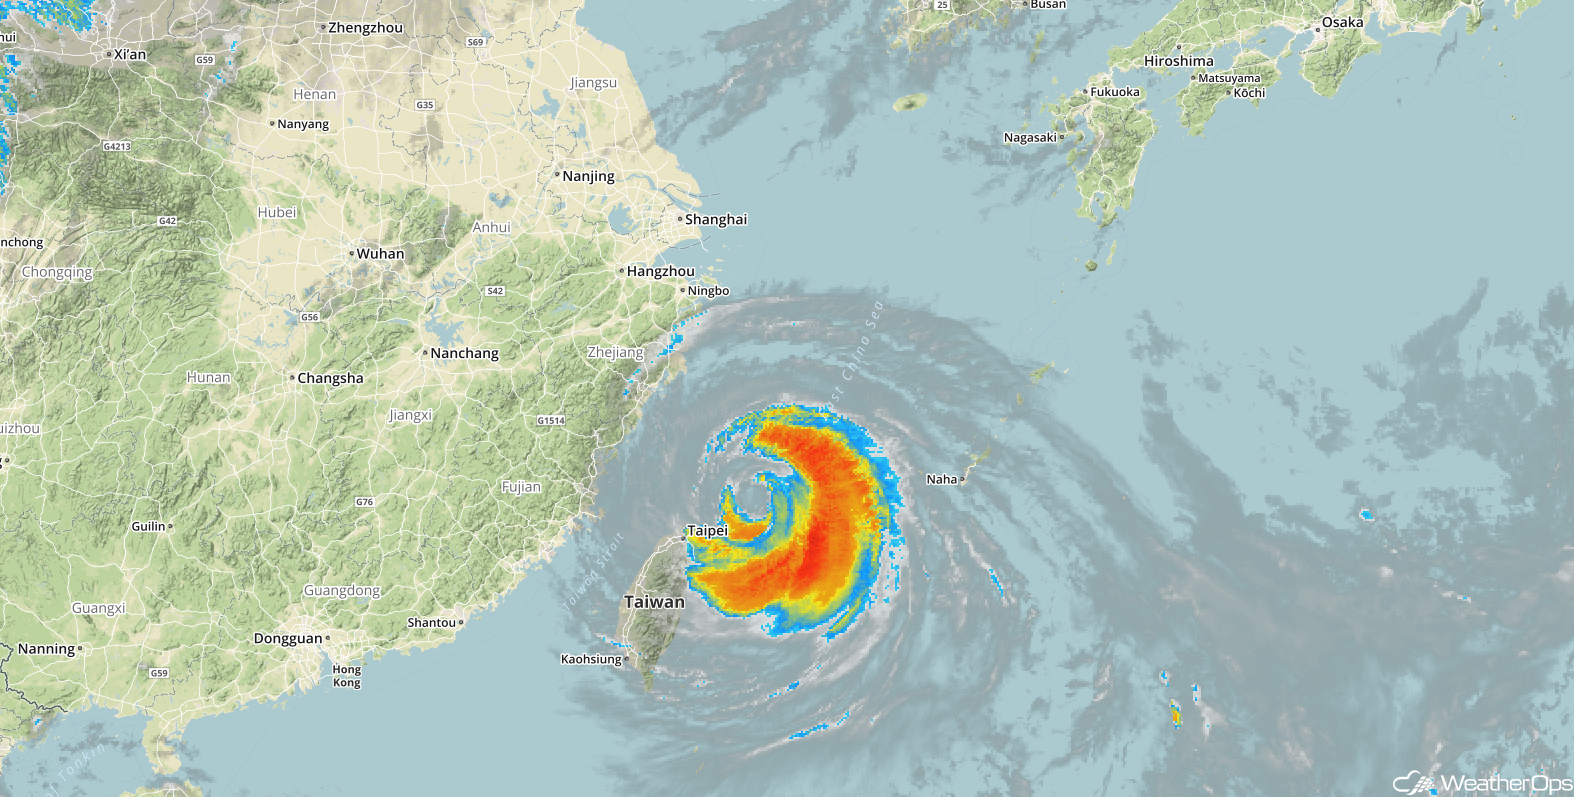 Typhoon Maria Enhanced Infrared Satellite Image